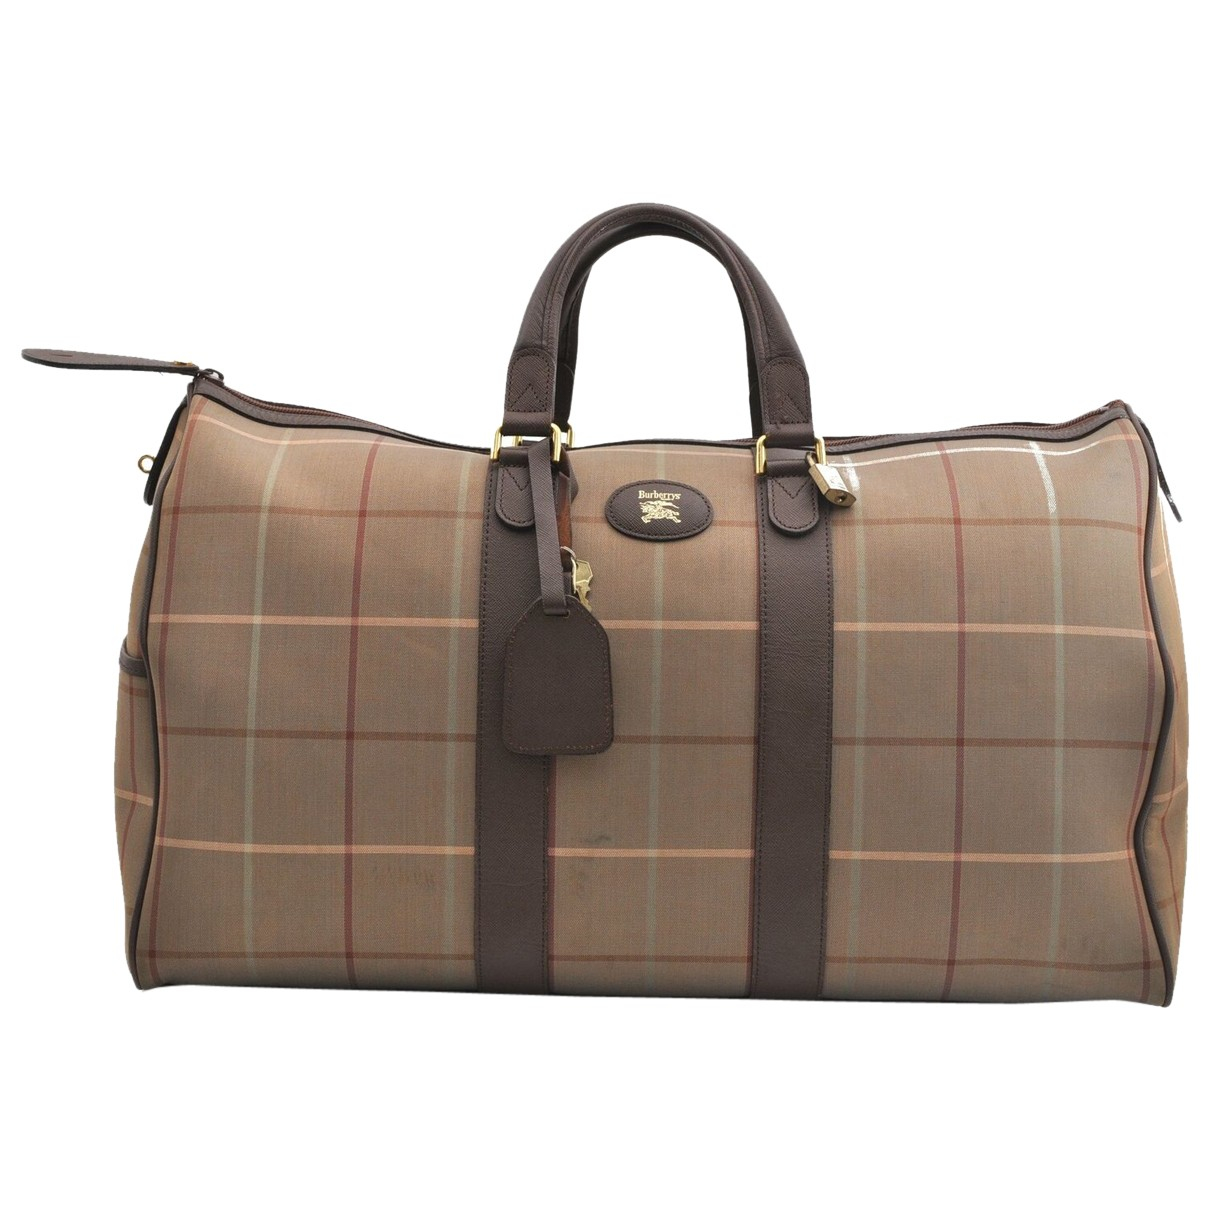 Burberry N Brown Cloth Travel bag for Women N